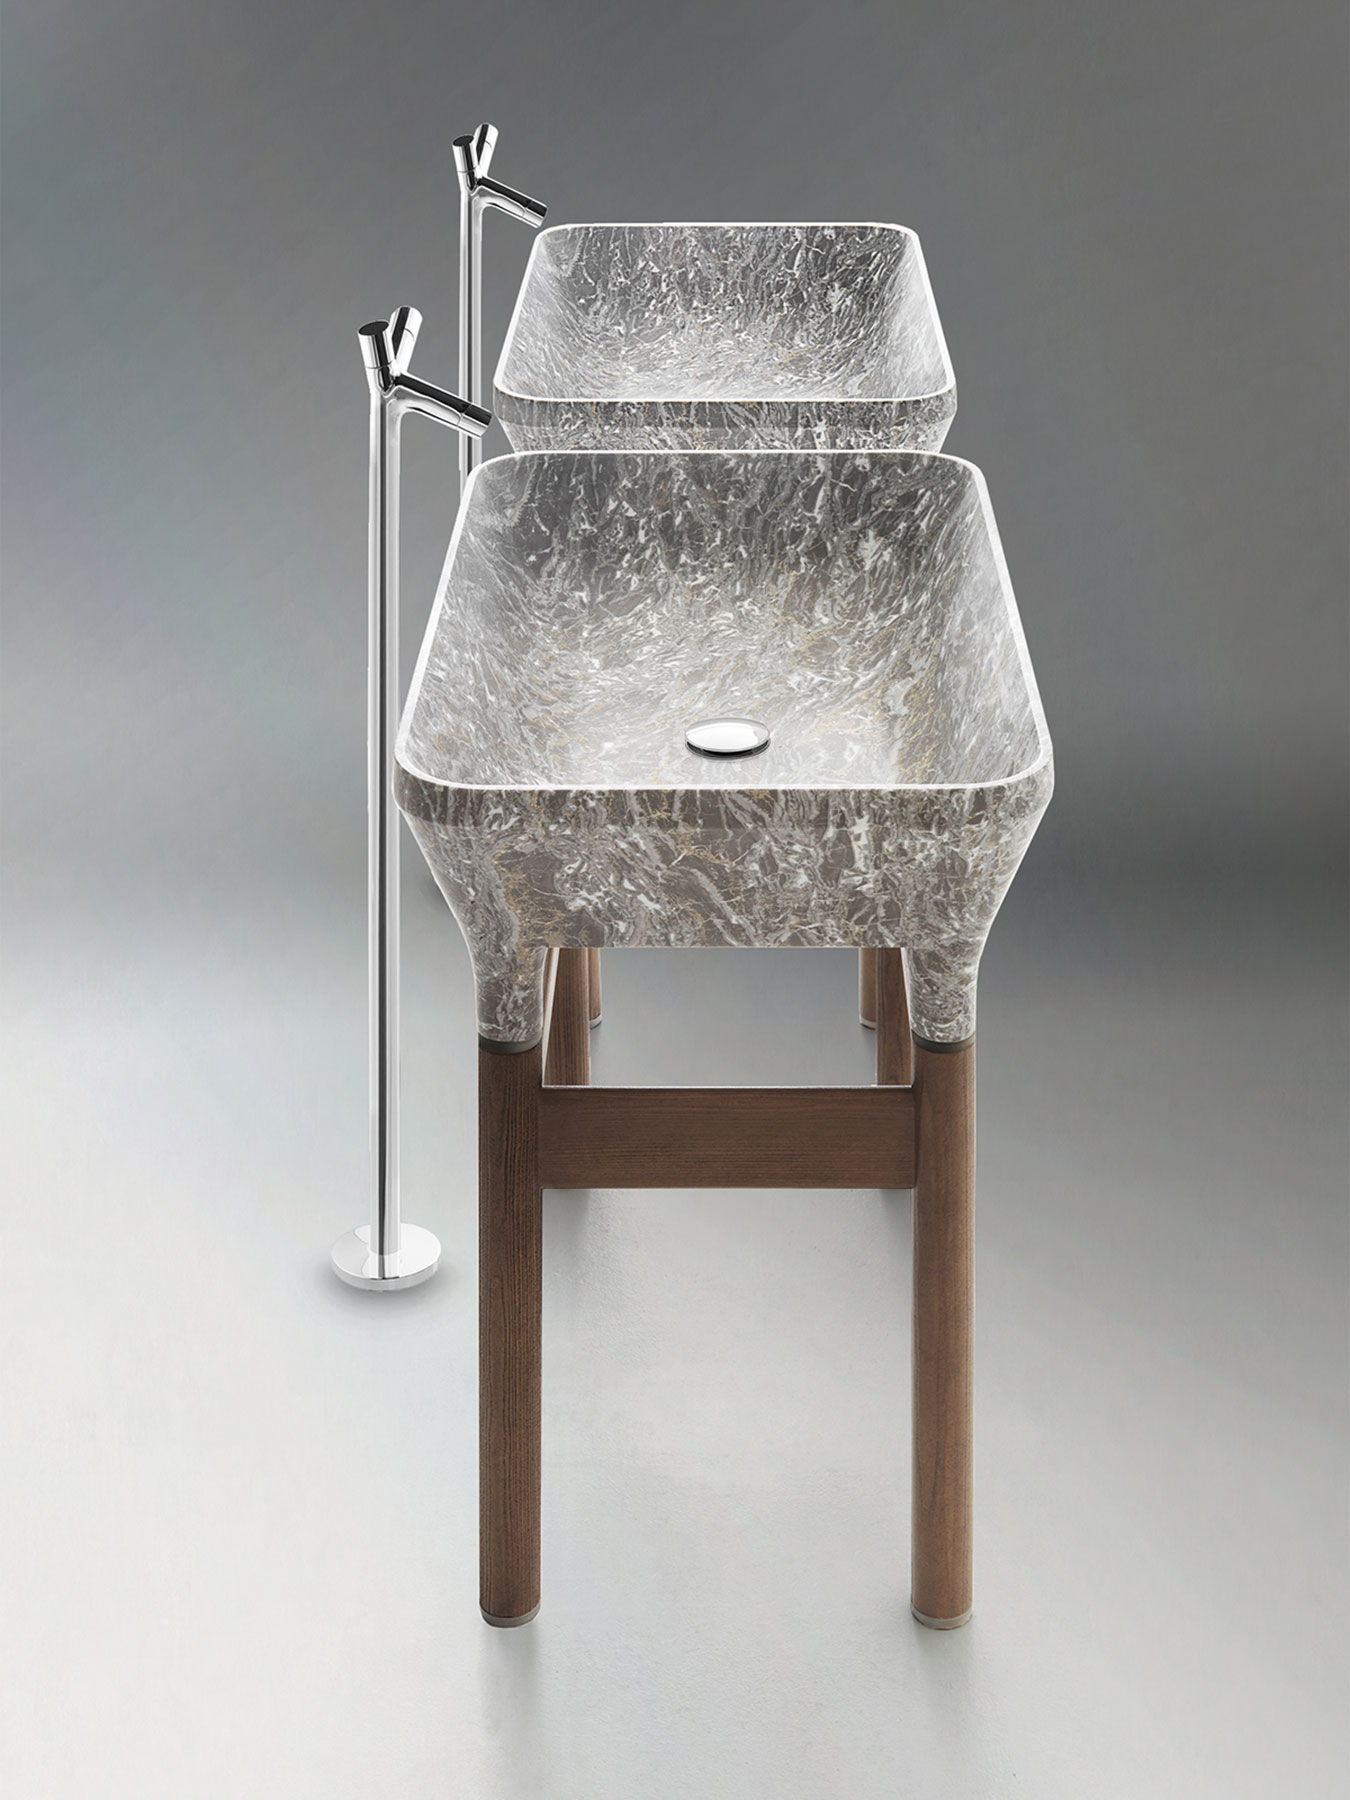 Transitional Loto Floor Mount Washbasin Set